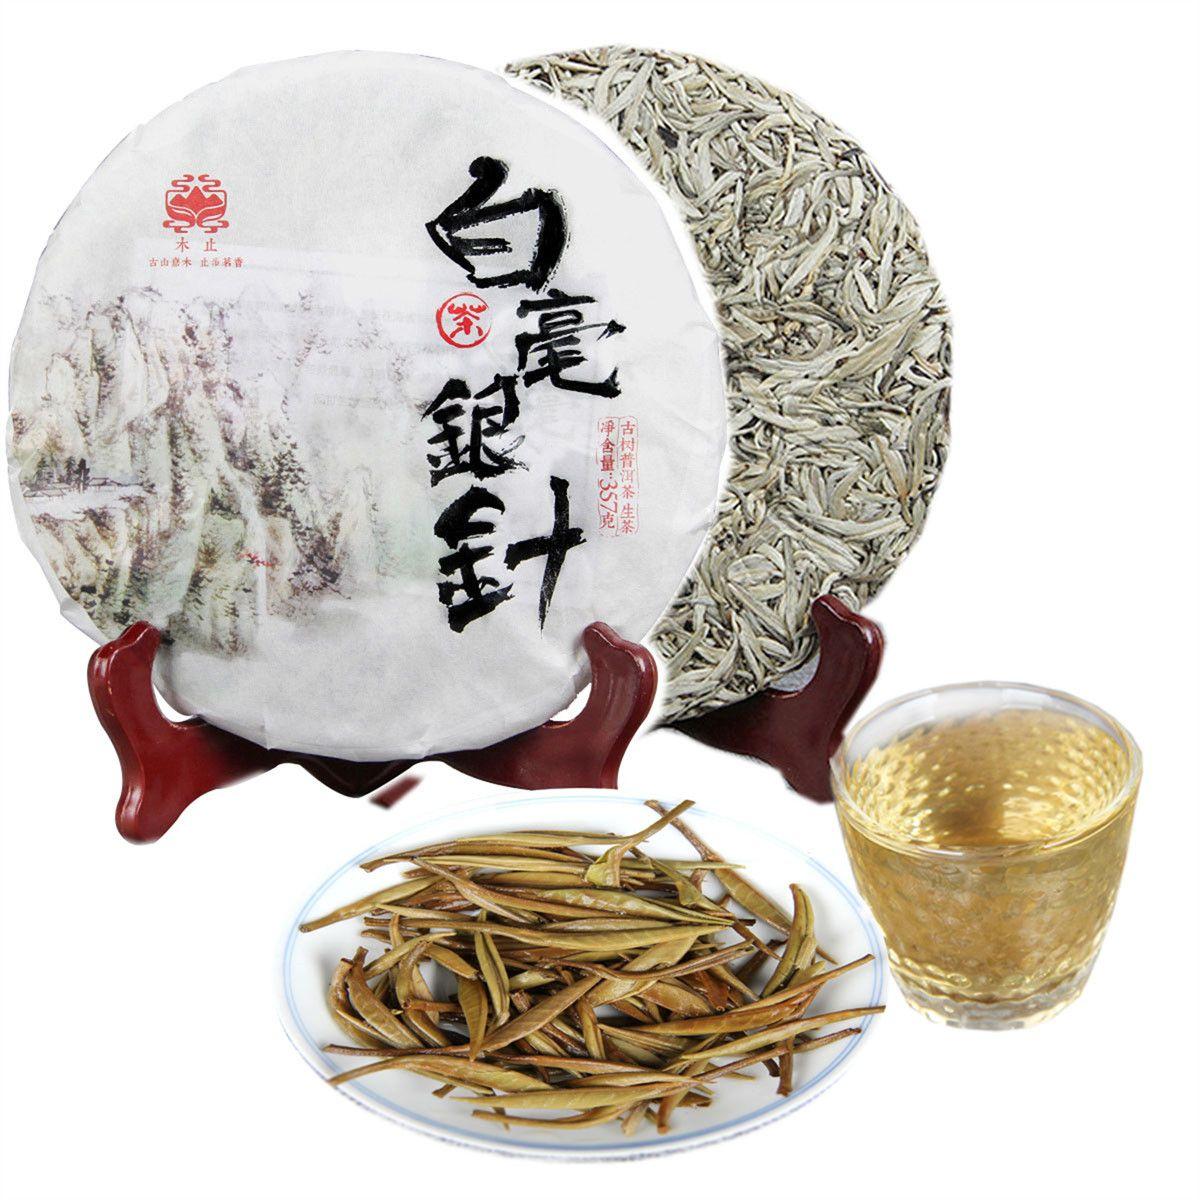 357g Raw Pu Er del tè Yunnan Bianco ago d'argento dell'unità di elaborazione er Pu'er tè organico verde Puer vecchi albero naturale Puerh Torta Vendite dirette della fabbrica